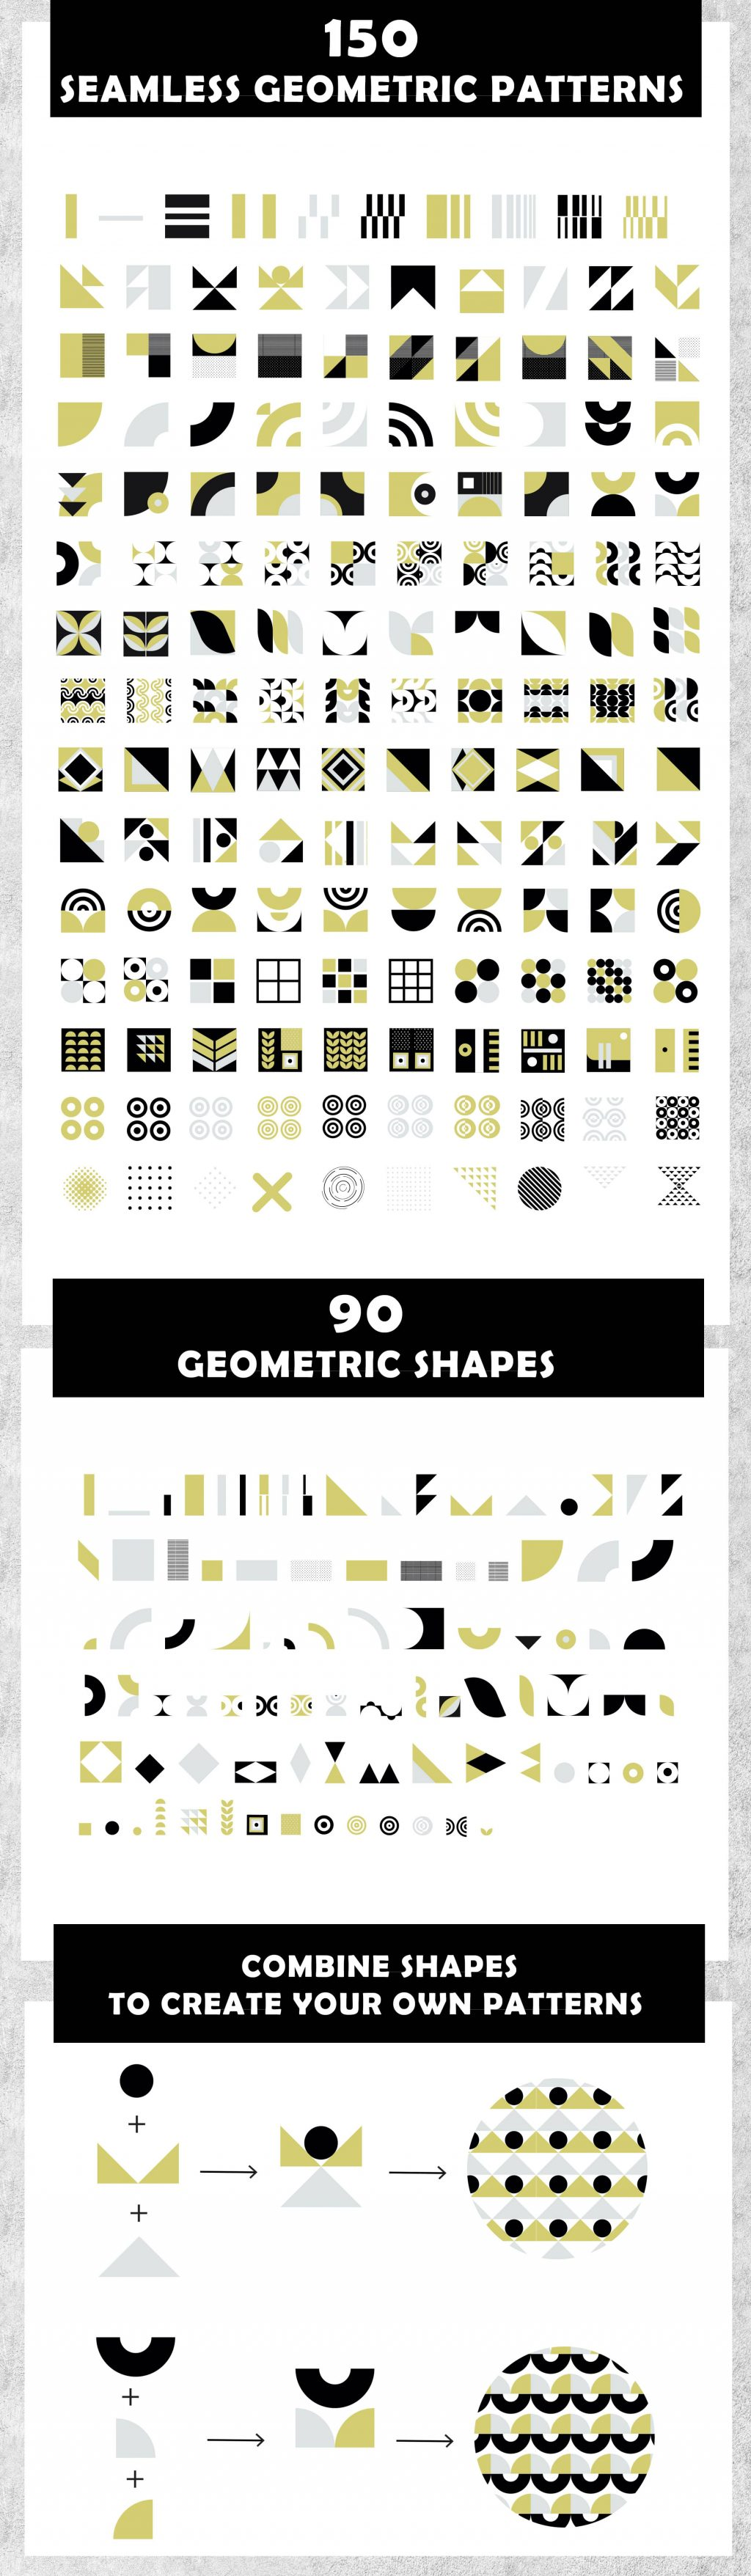 240+ Eye-catching Seamless Geometric Backgrounds, Shapes & Patterns - P 2 min